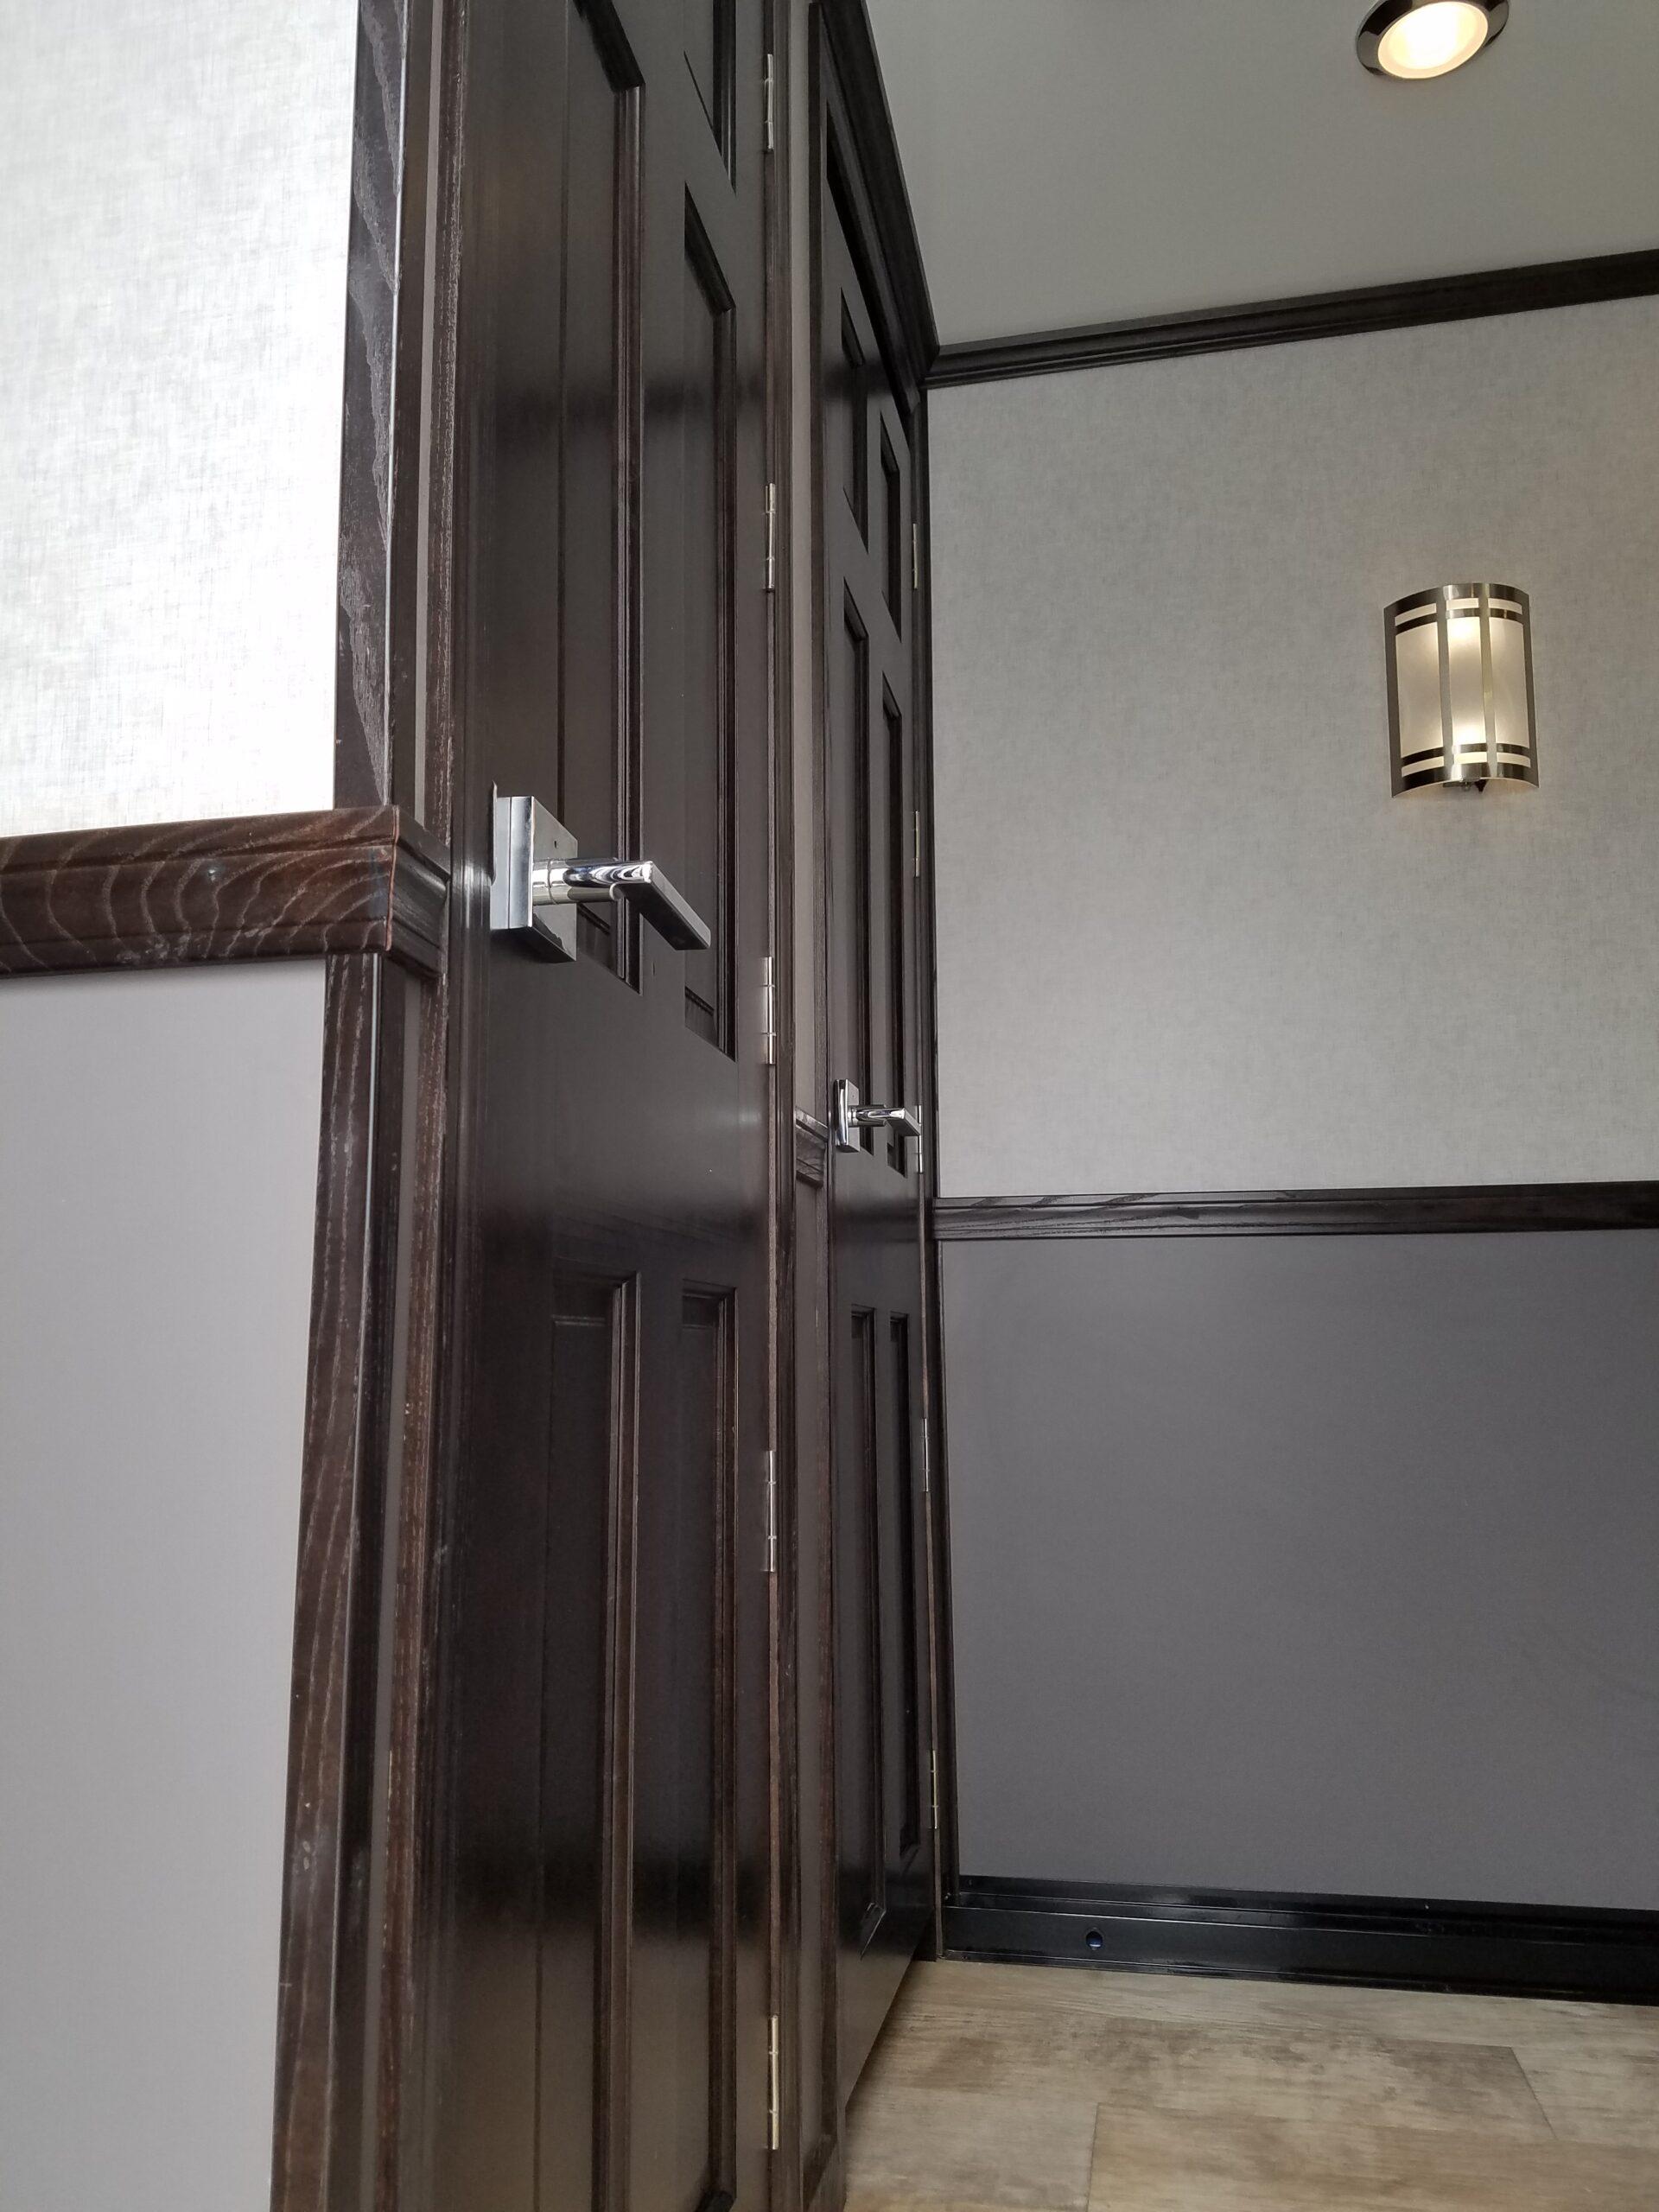 Ten Station Rolls Royce inside doors